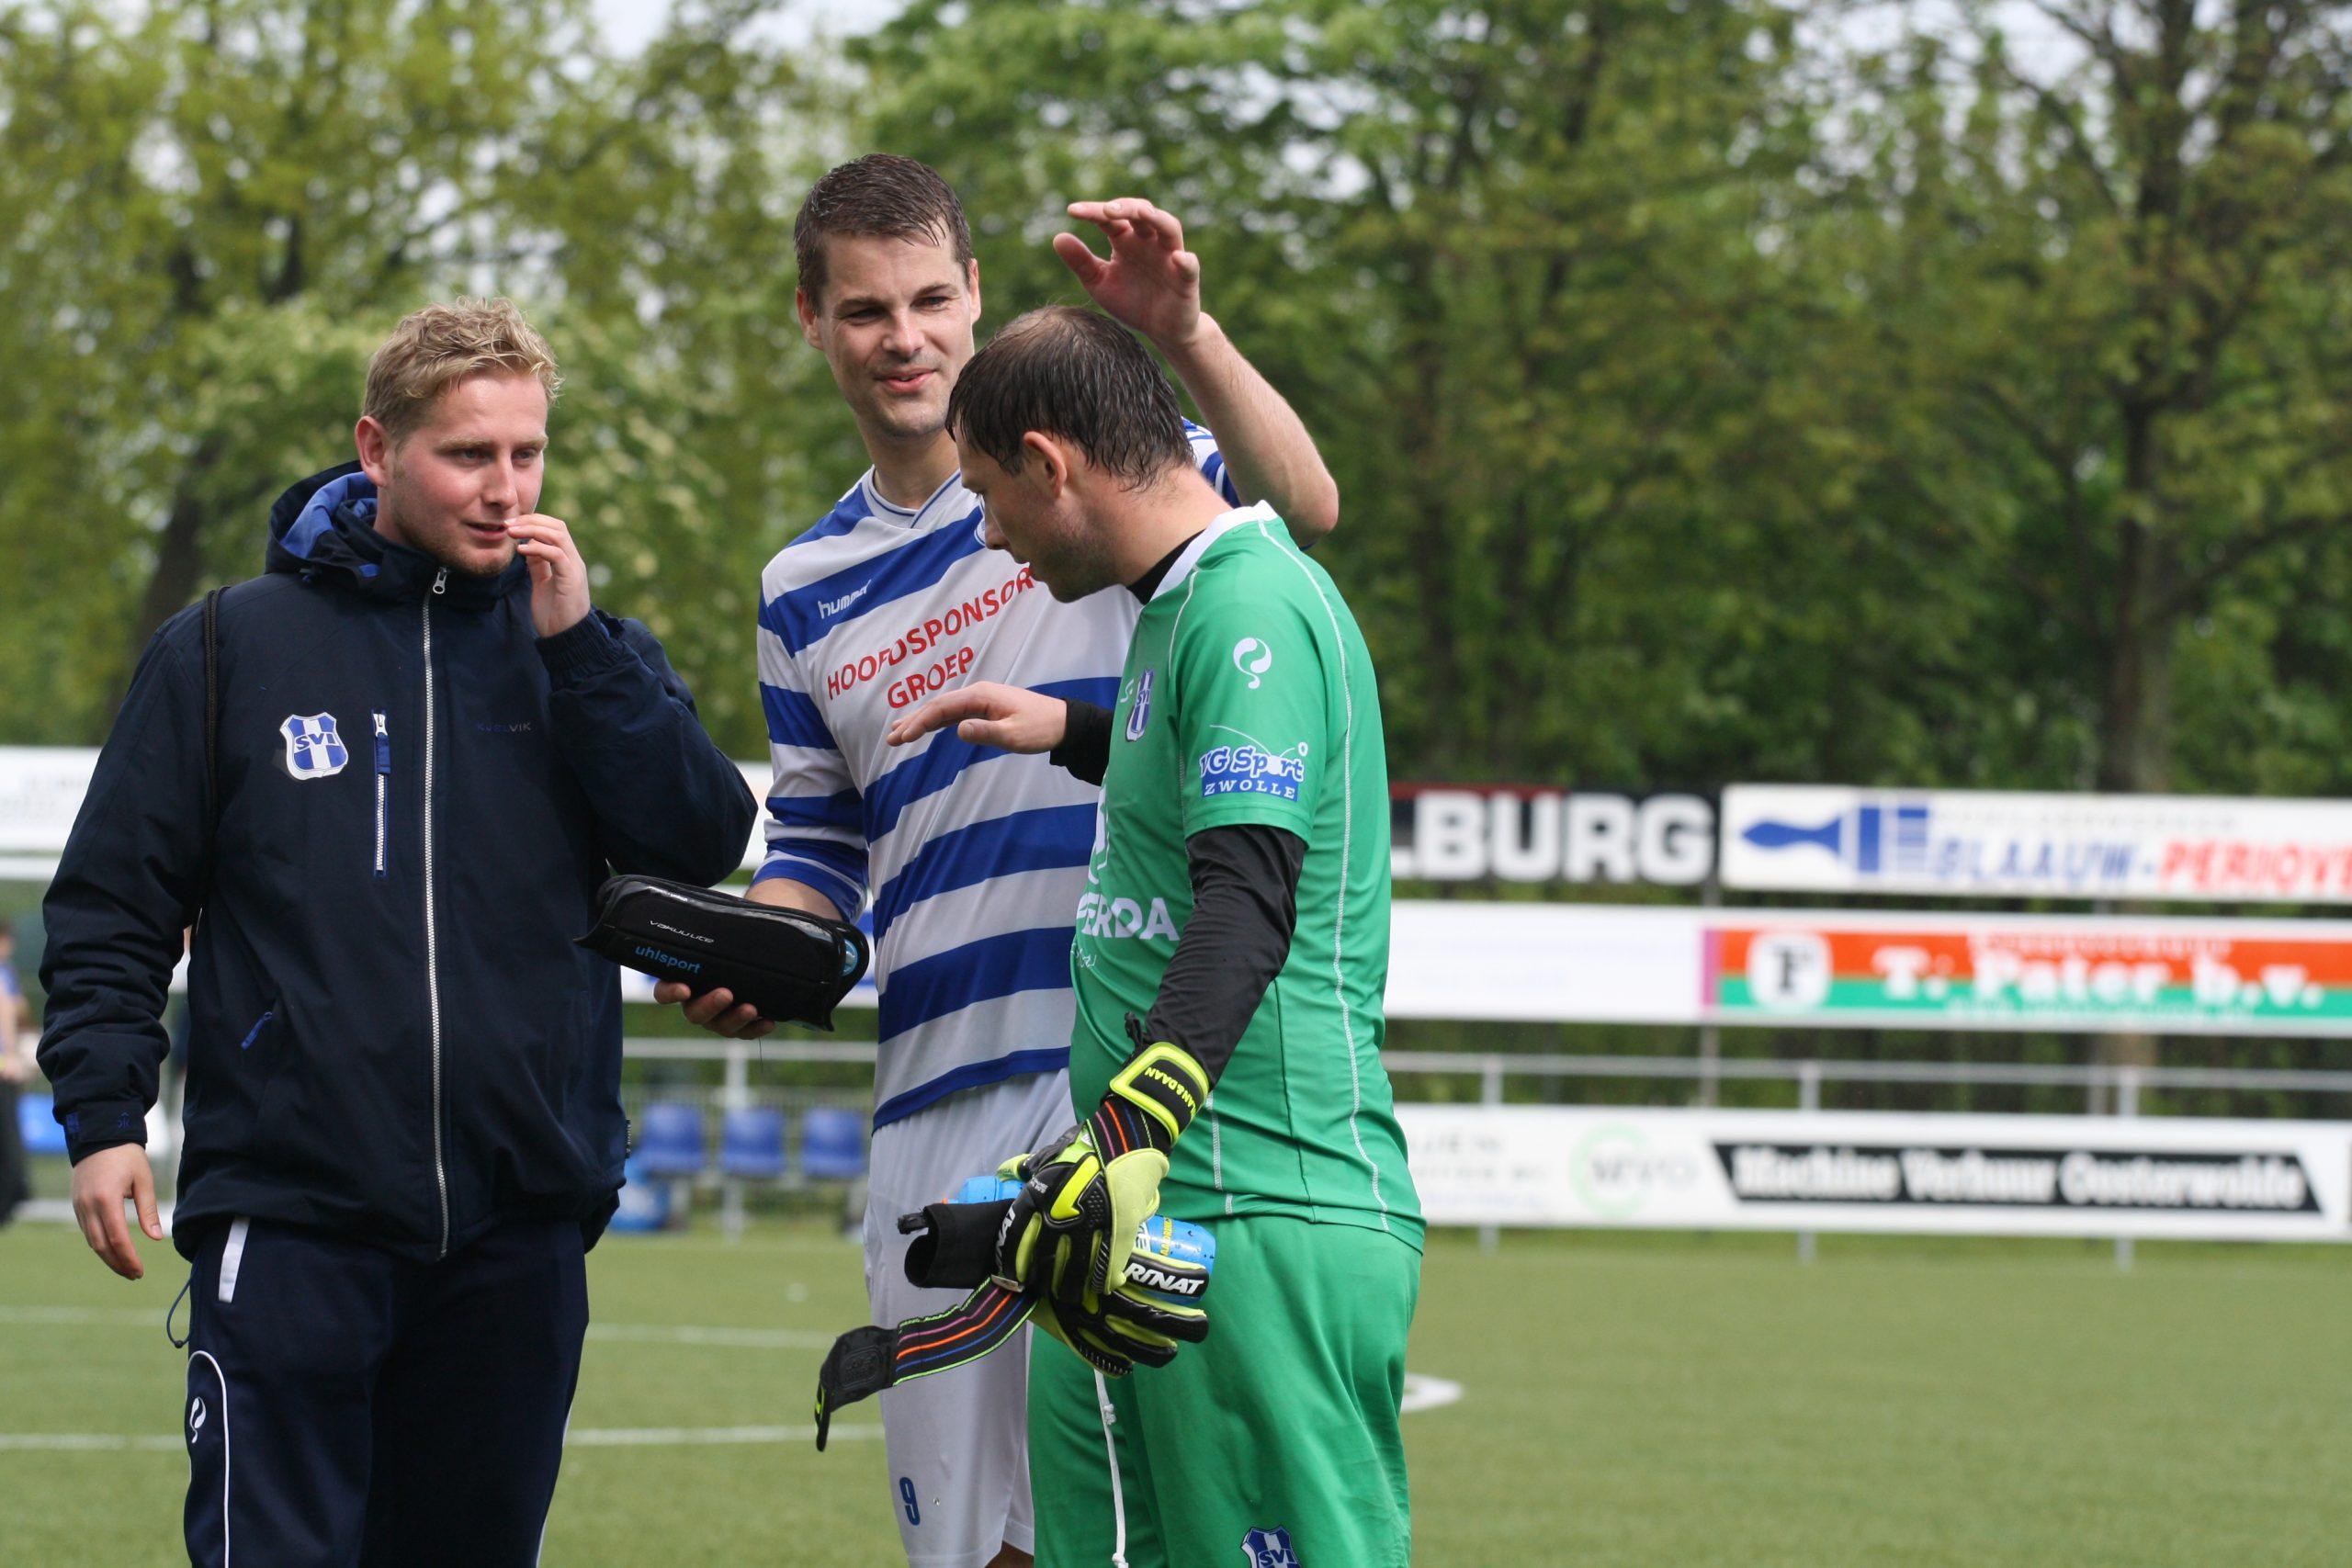 Elburger Sportclub en SVI delen de punten op slotdag: 2-2 - Elburger SC